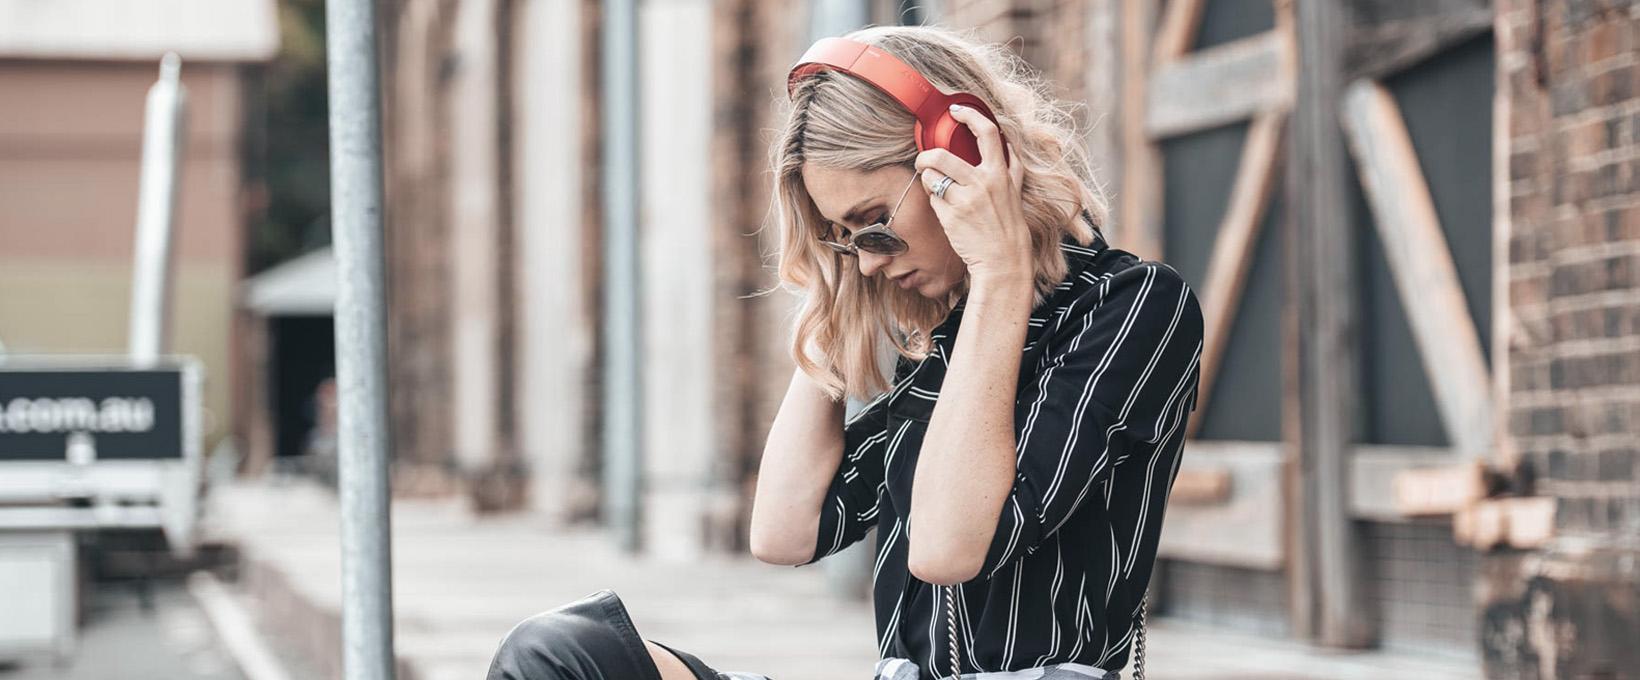 Bluetooth Headsets - Billiga Trådlösa hörlurar - Macskal 6e759b4d5213d